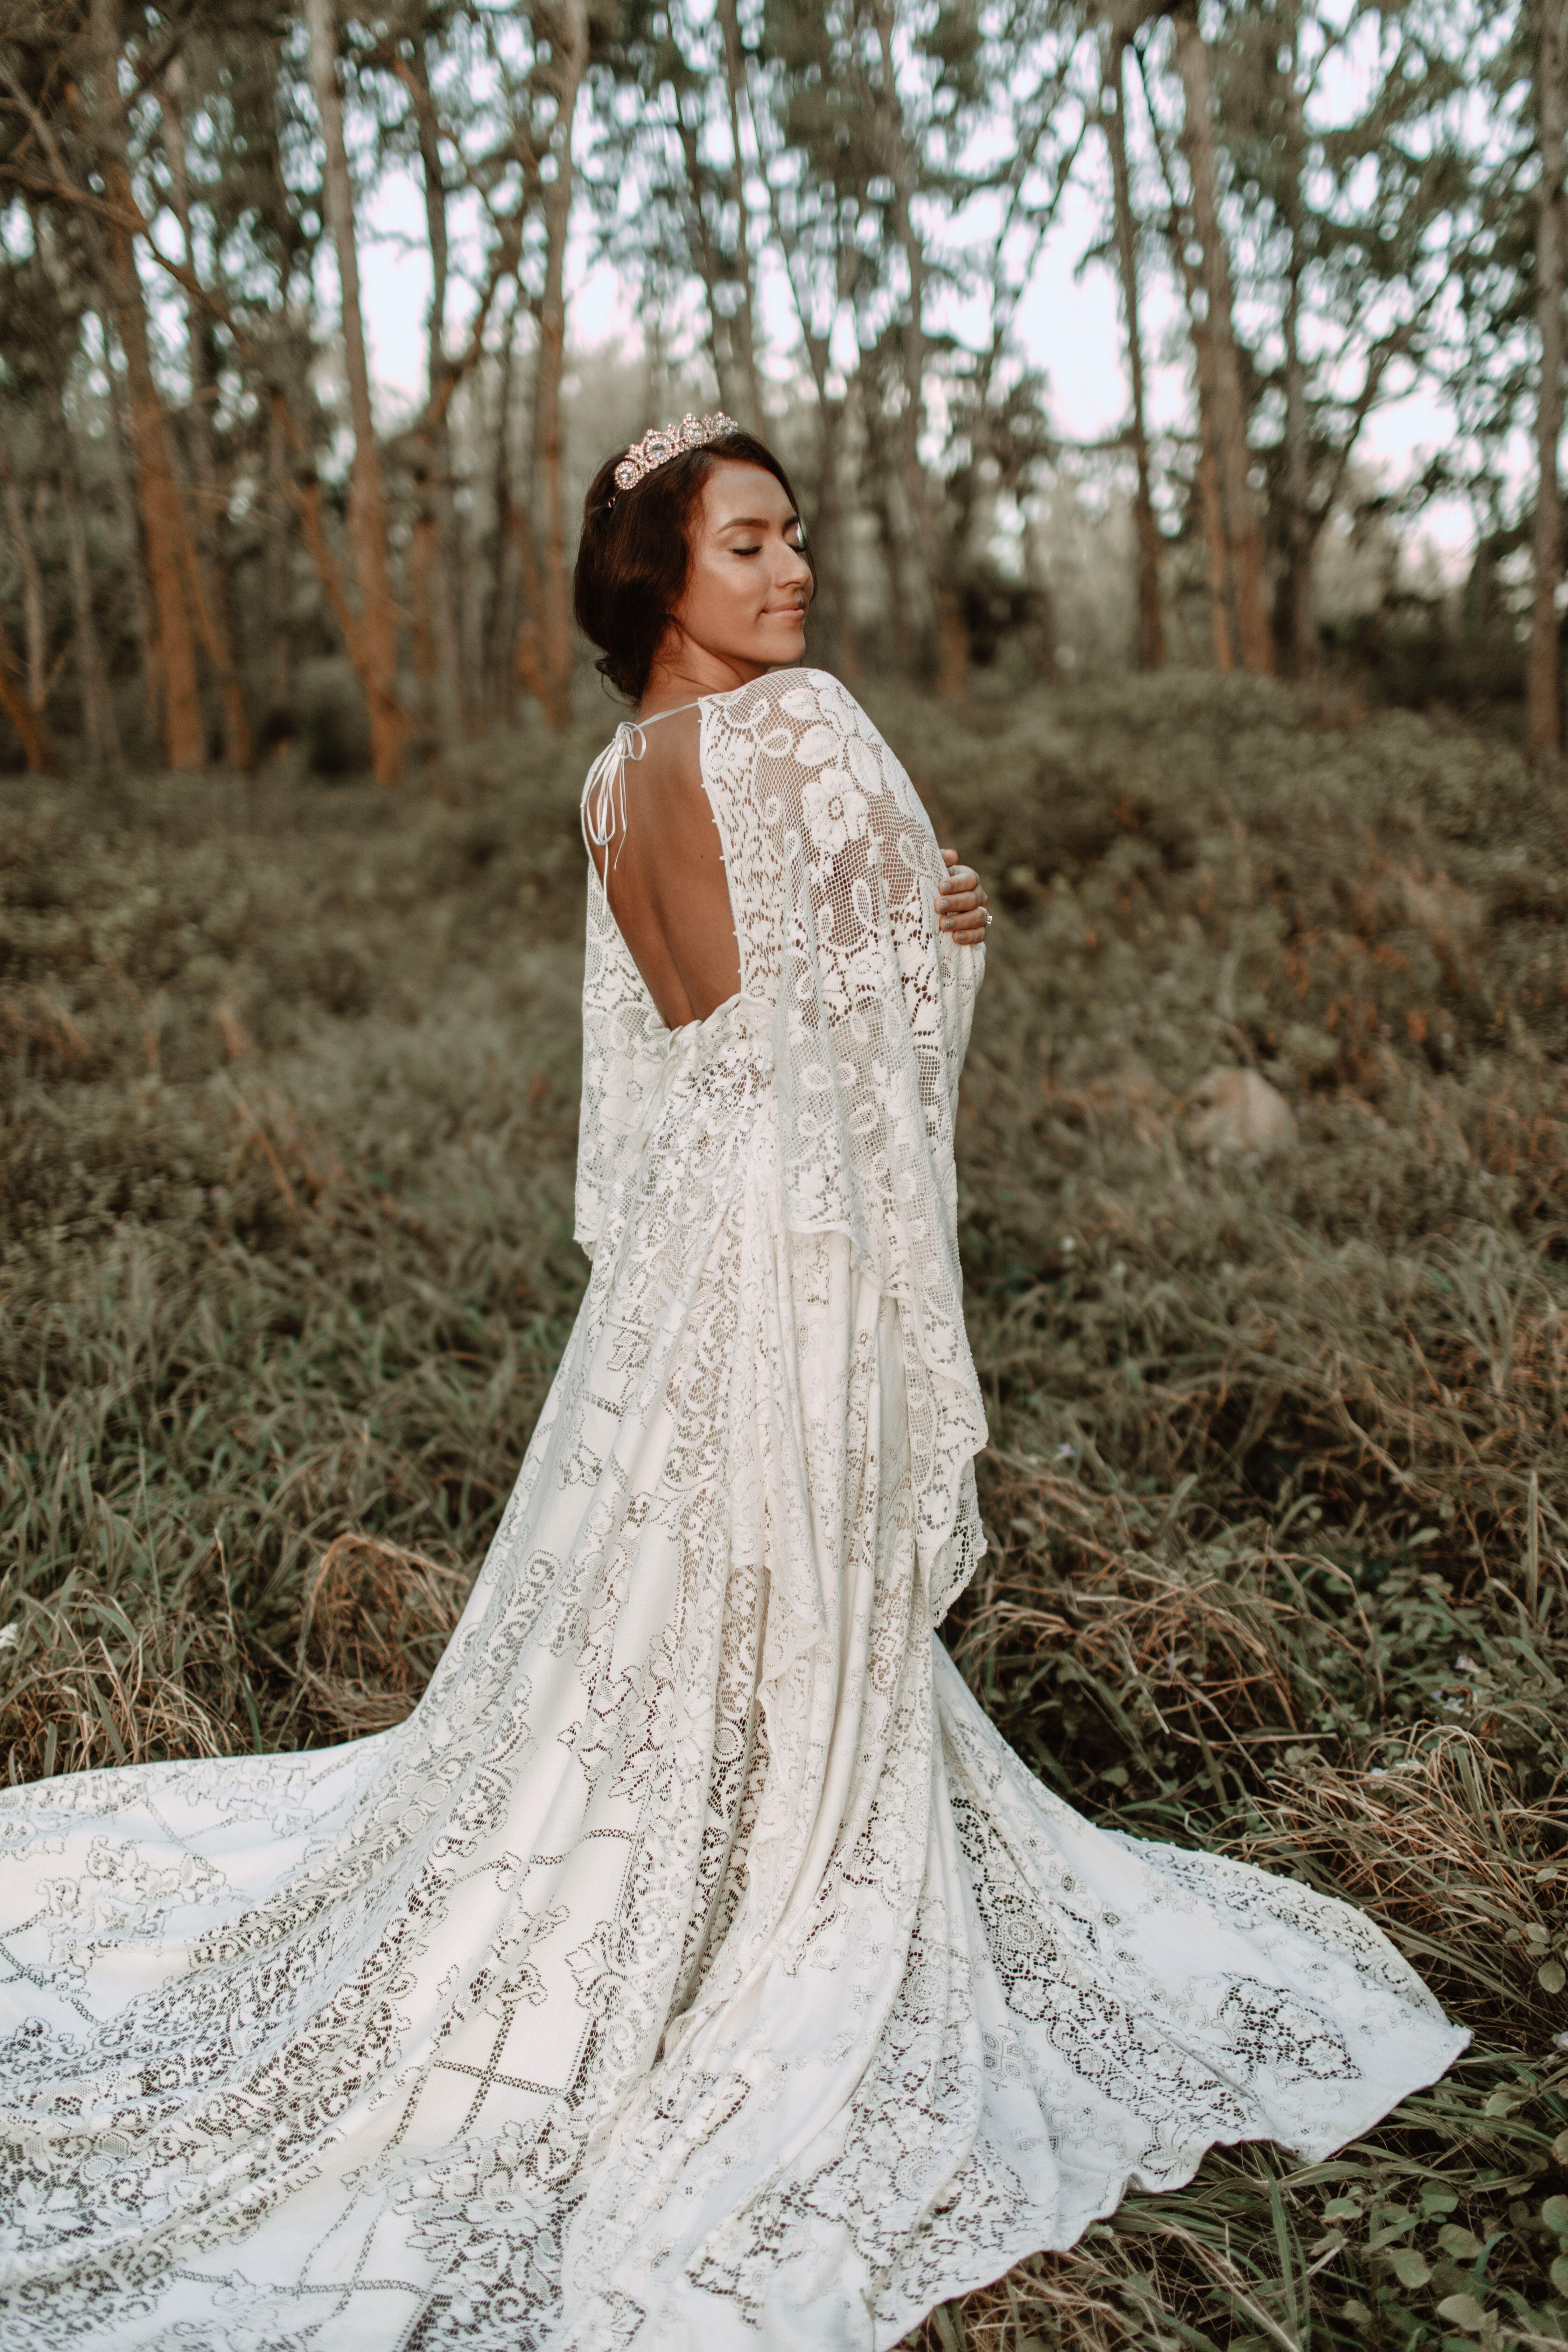 Reclamation Dress Luxury Destination Wedding Photography